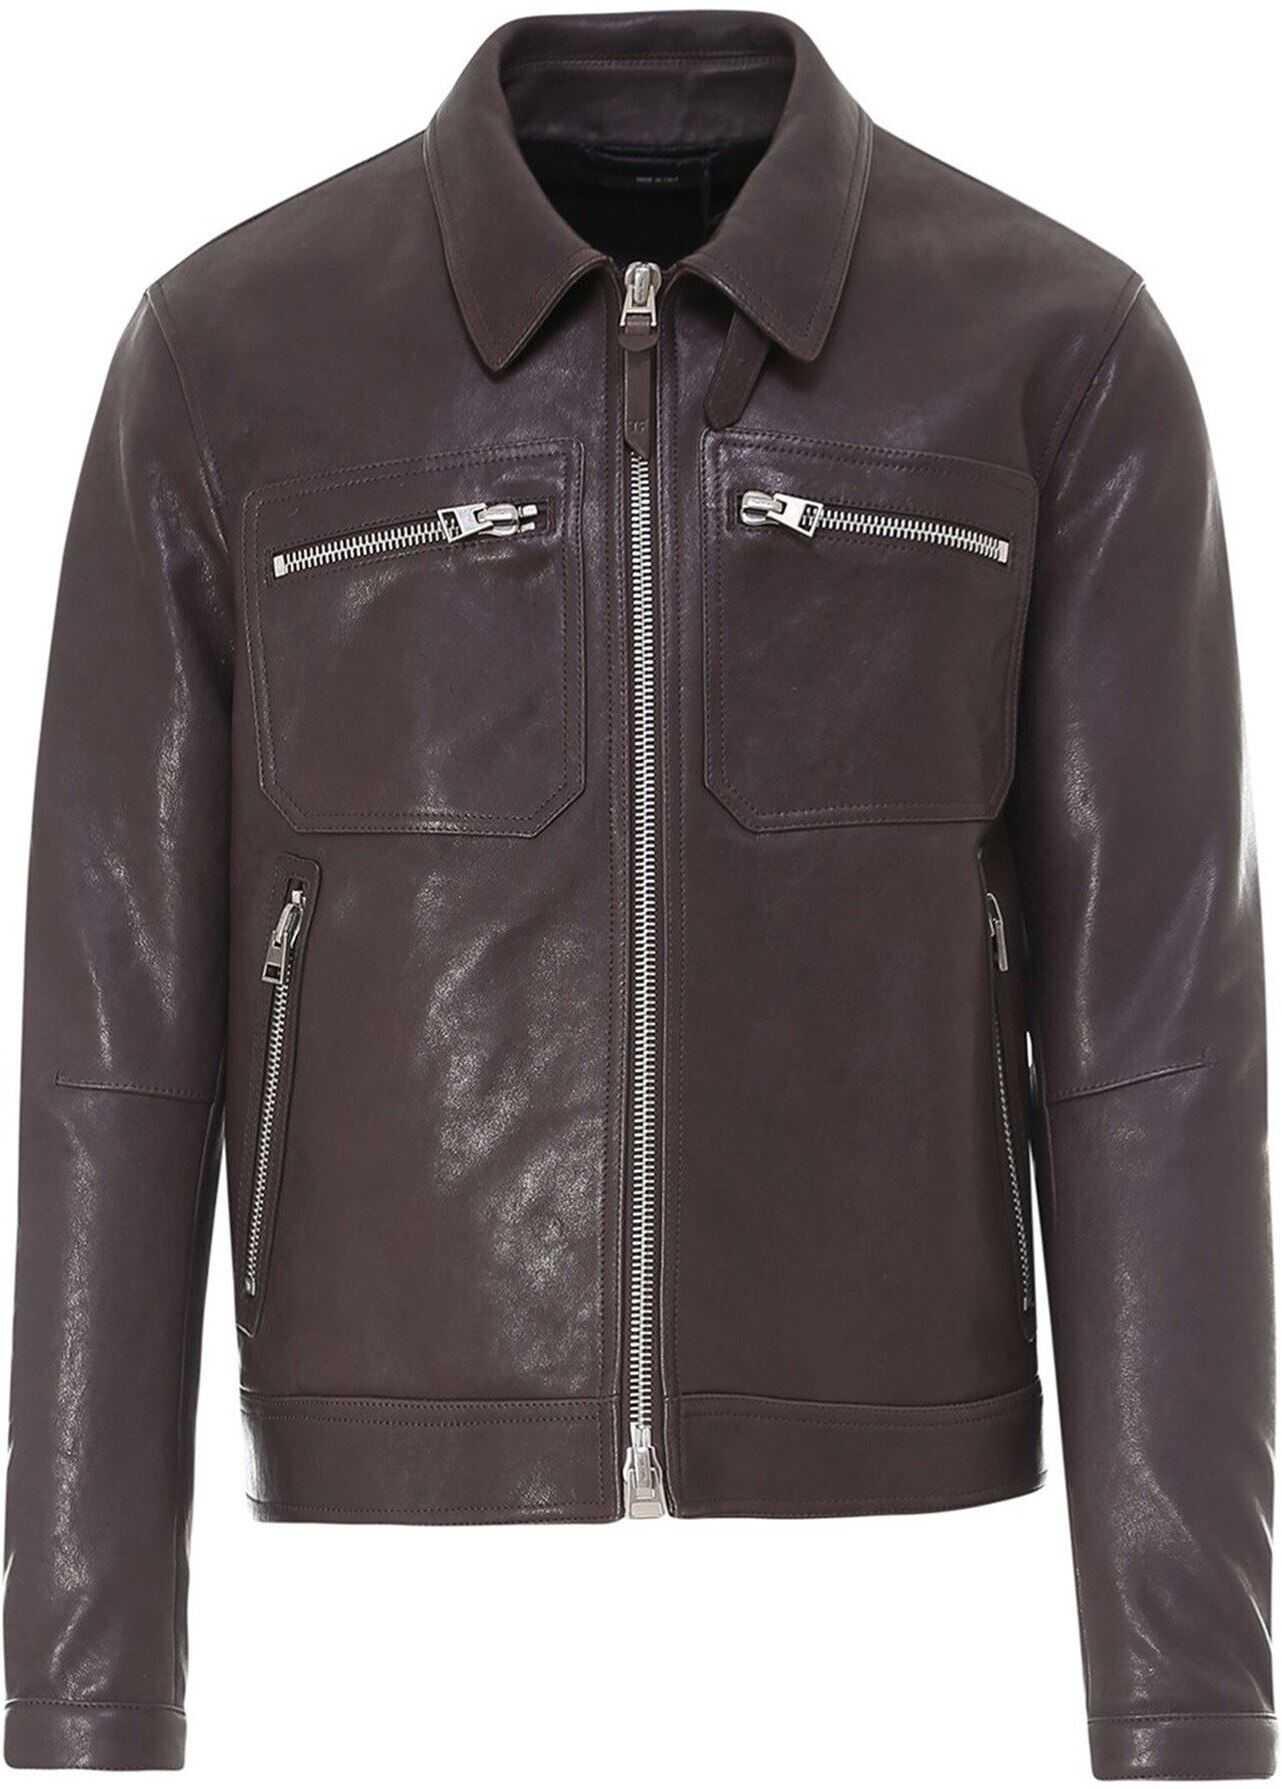 Tom Ford Leather Biker Jacket In Brown Brown imagine